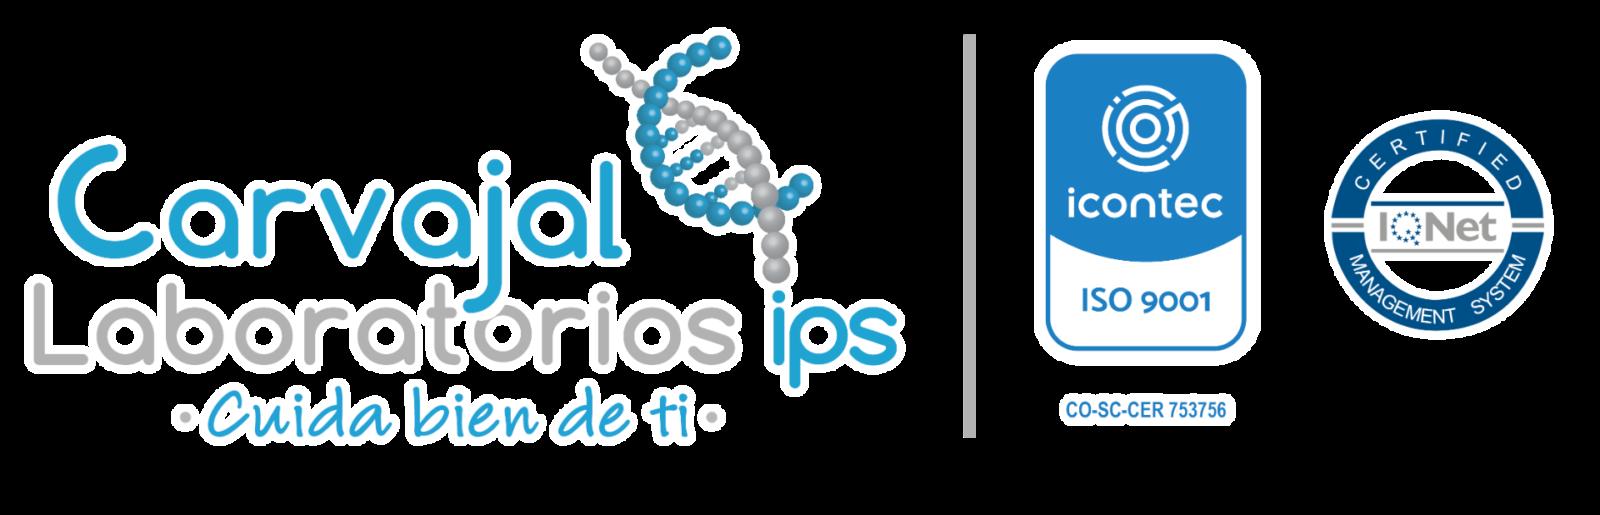 Carvajal Laboratorios IPS